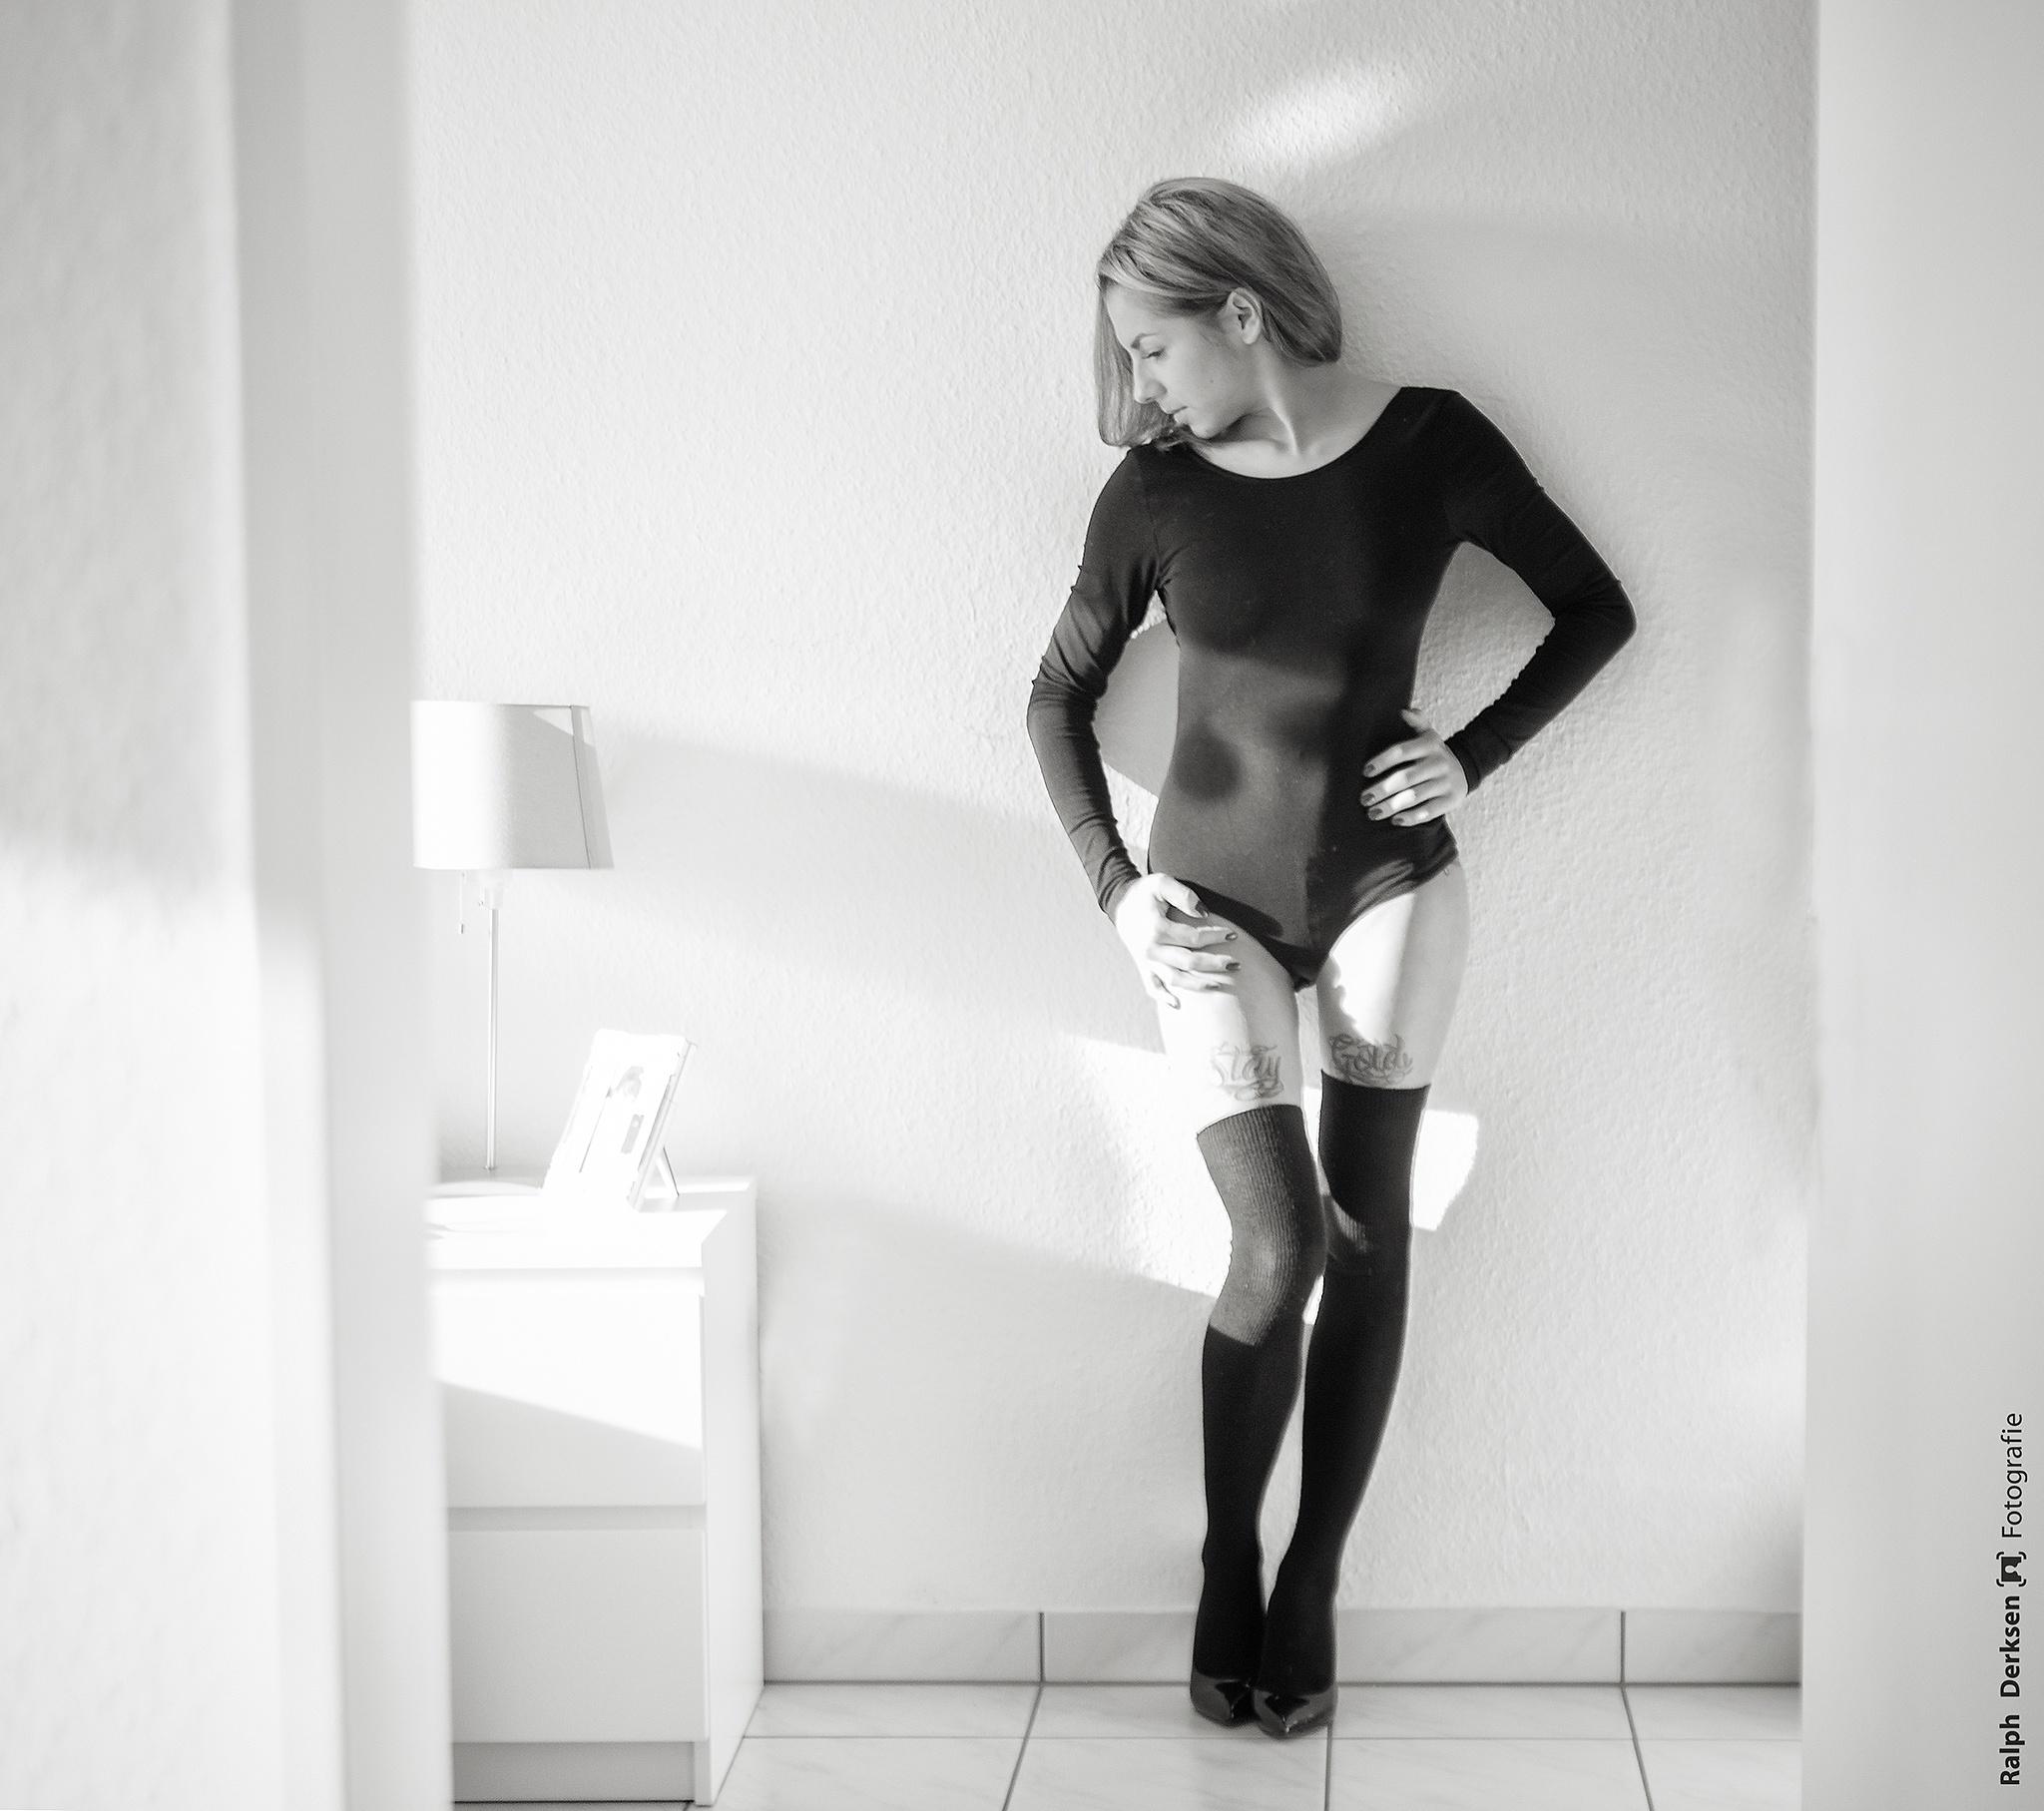 standing still by Ralph Derksen Fotografie